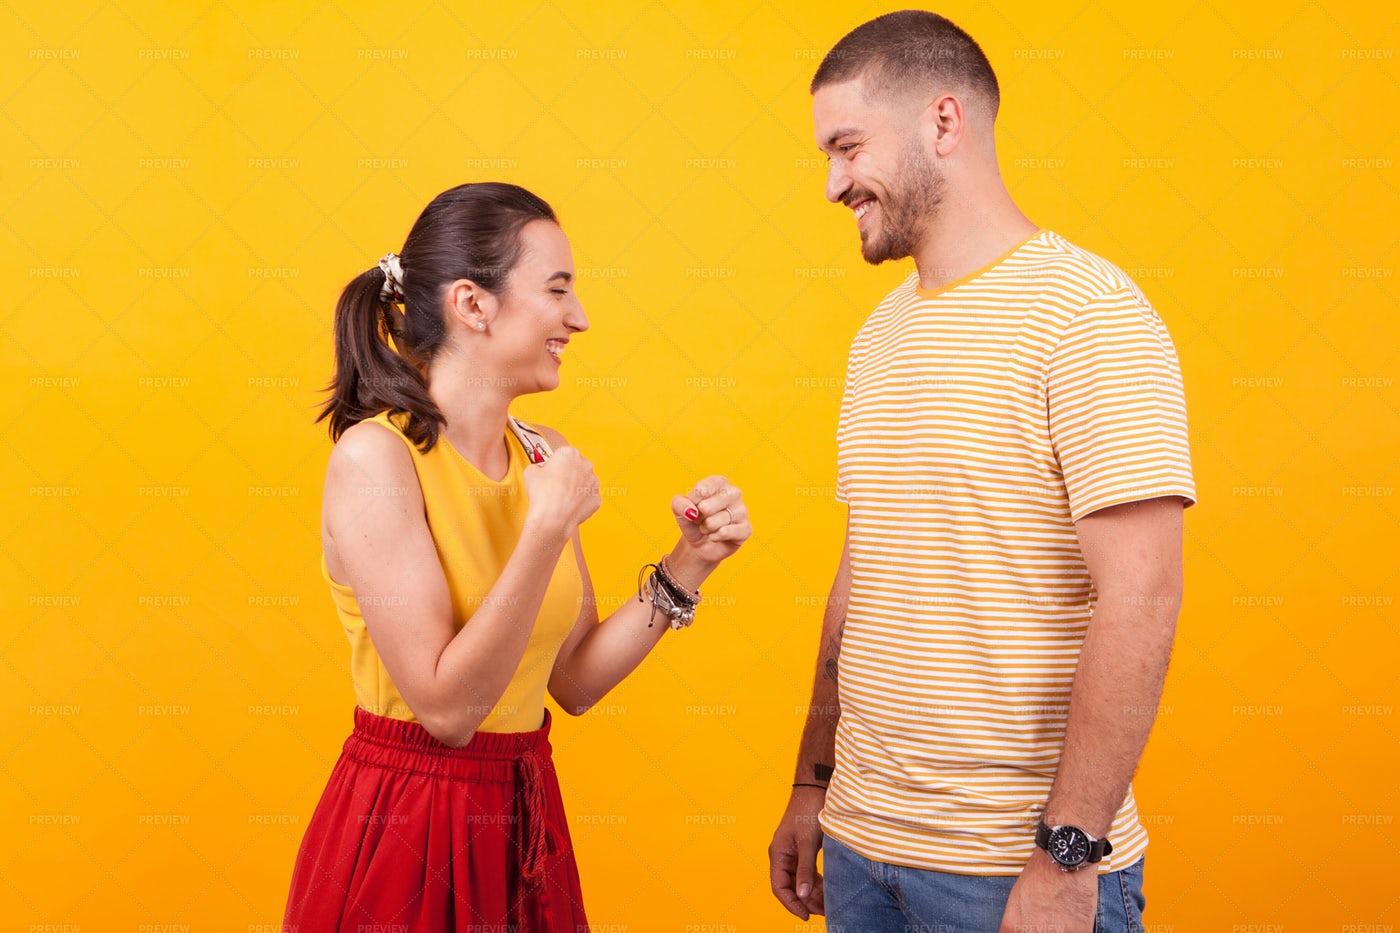 Play Fighting Couple: Stock Photos